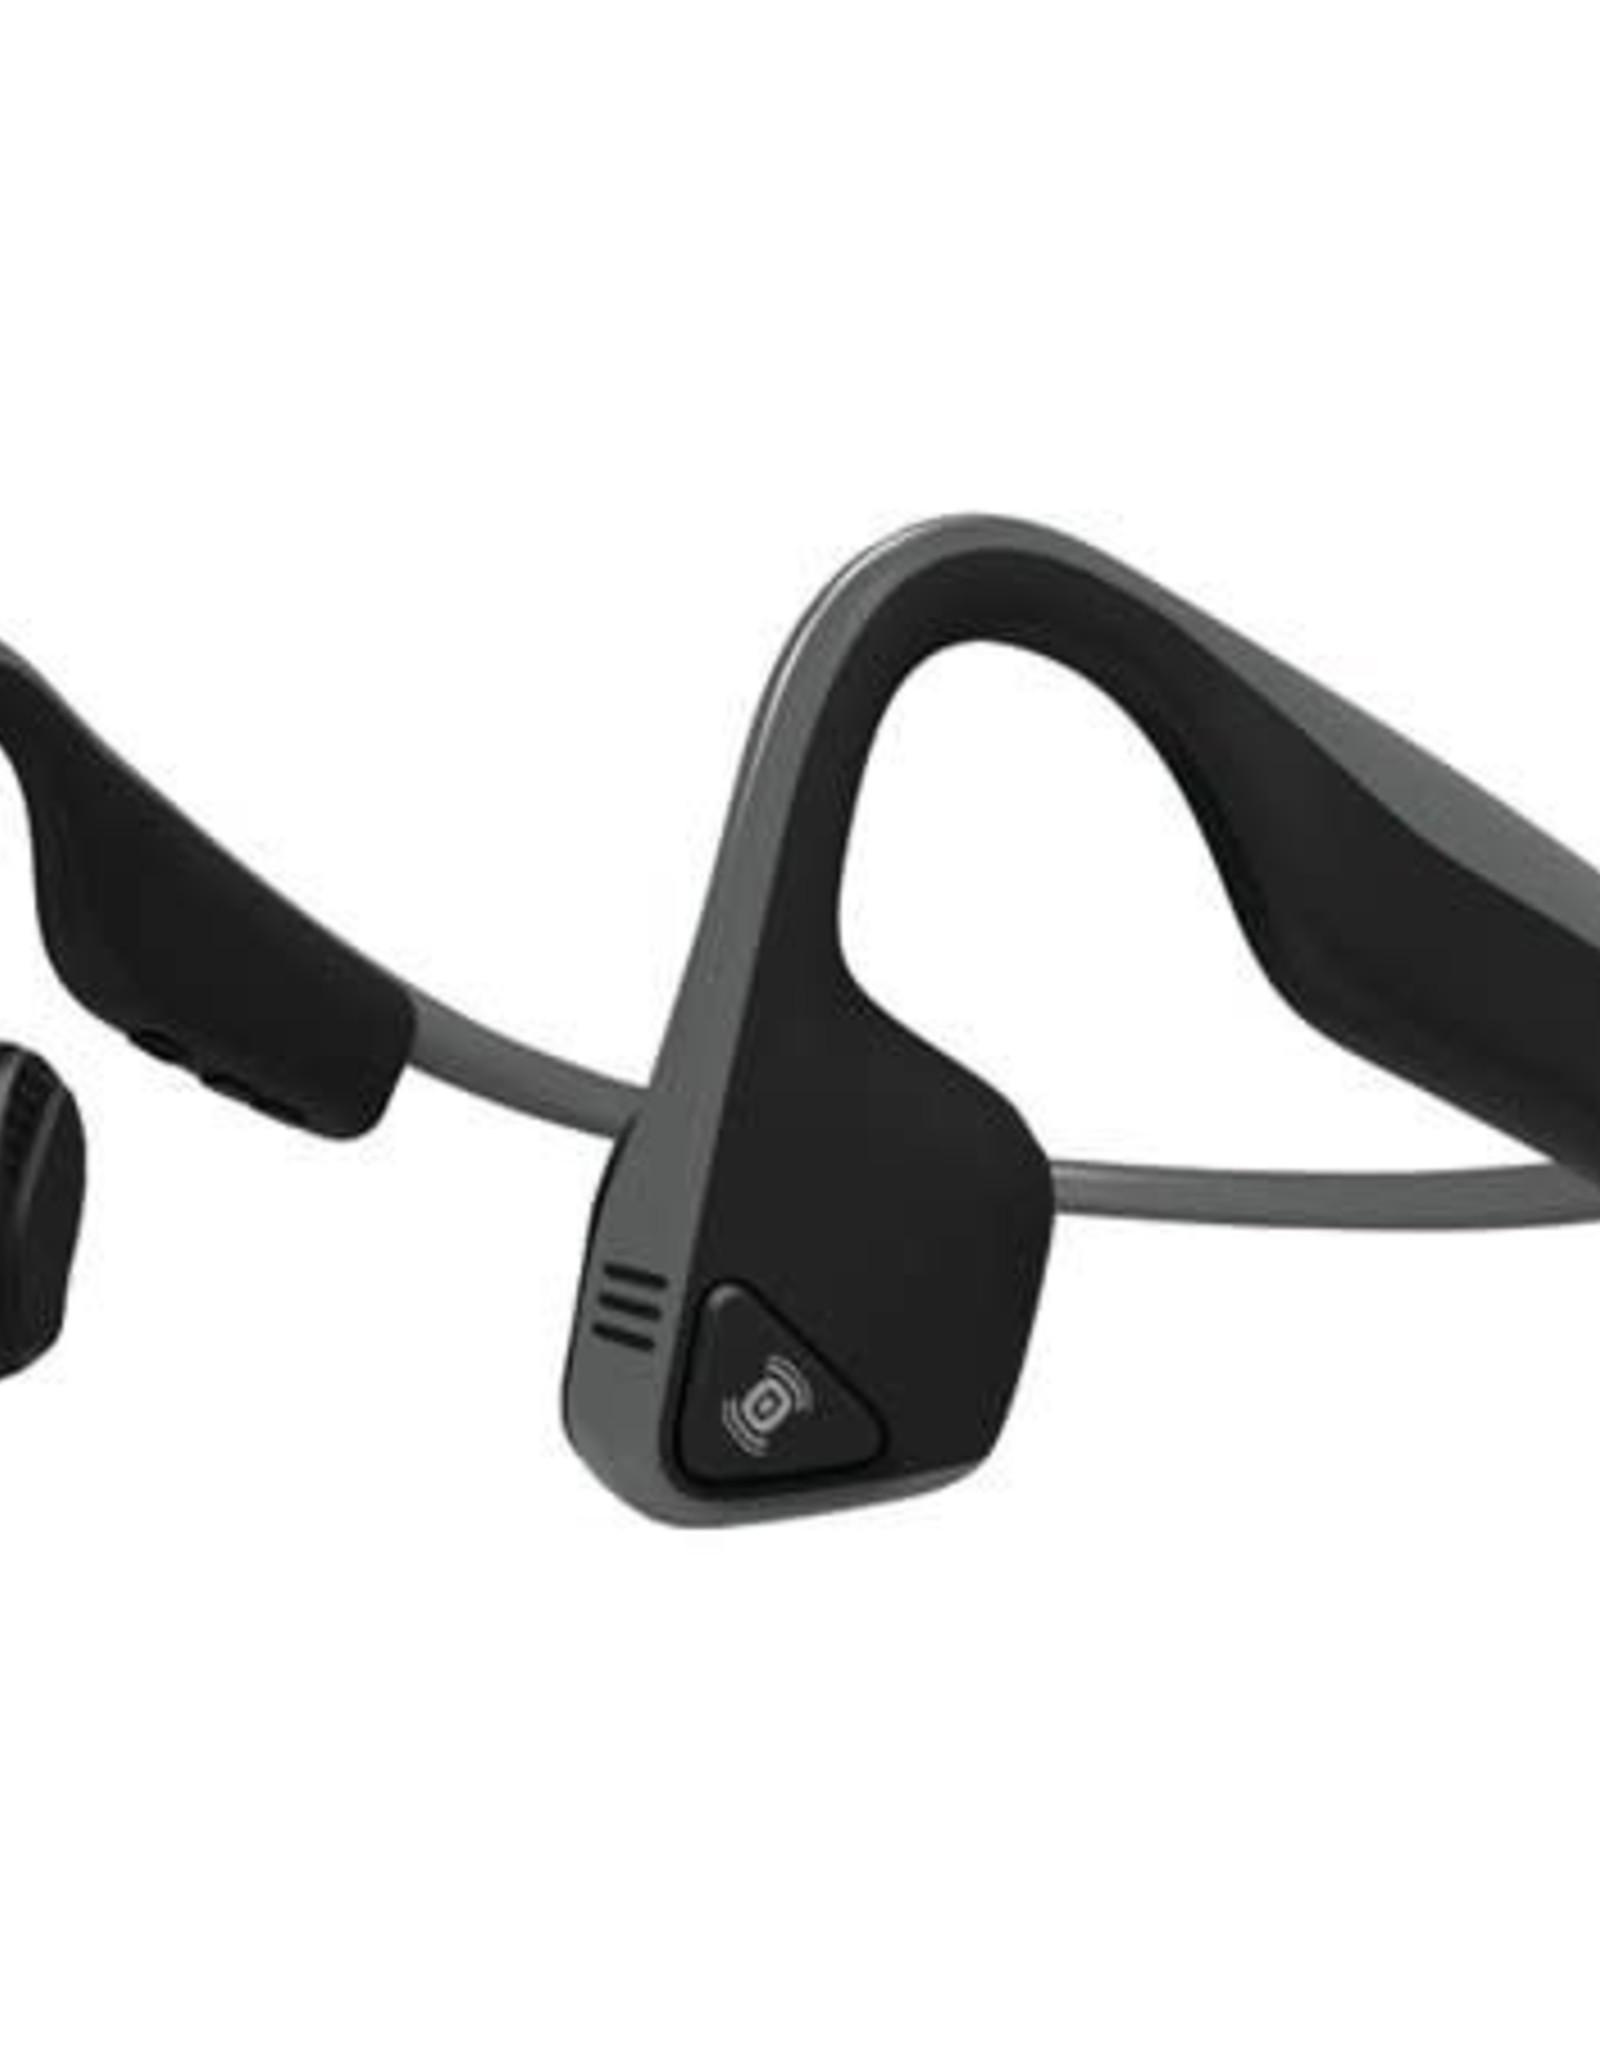 Aftershokz Aftershokz | Trekz Titanium Mini BT 4.1 Headphone Slate Grey| 45799